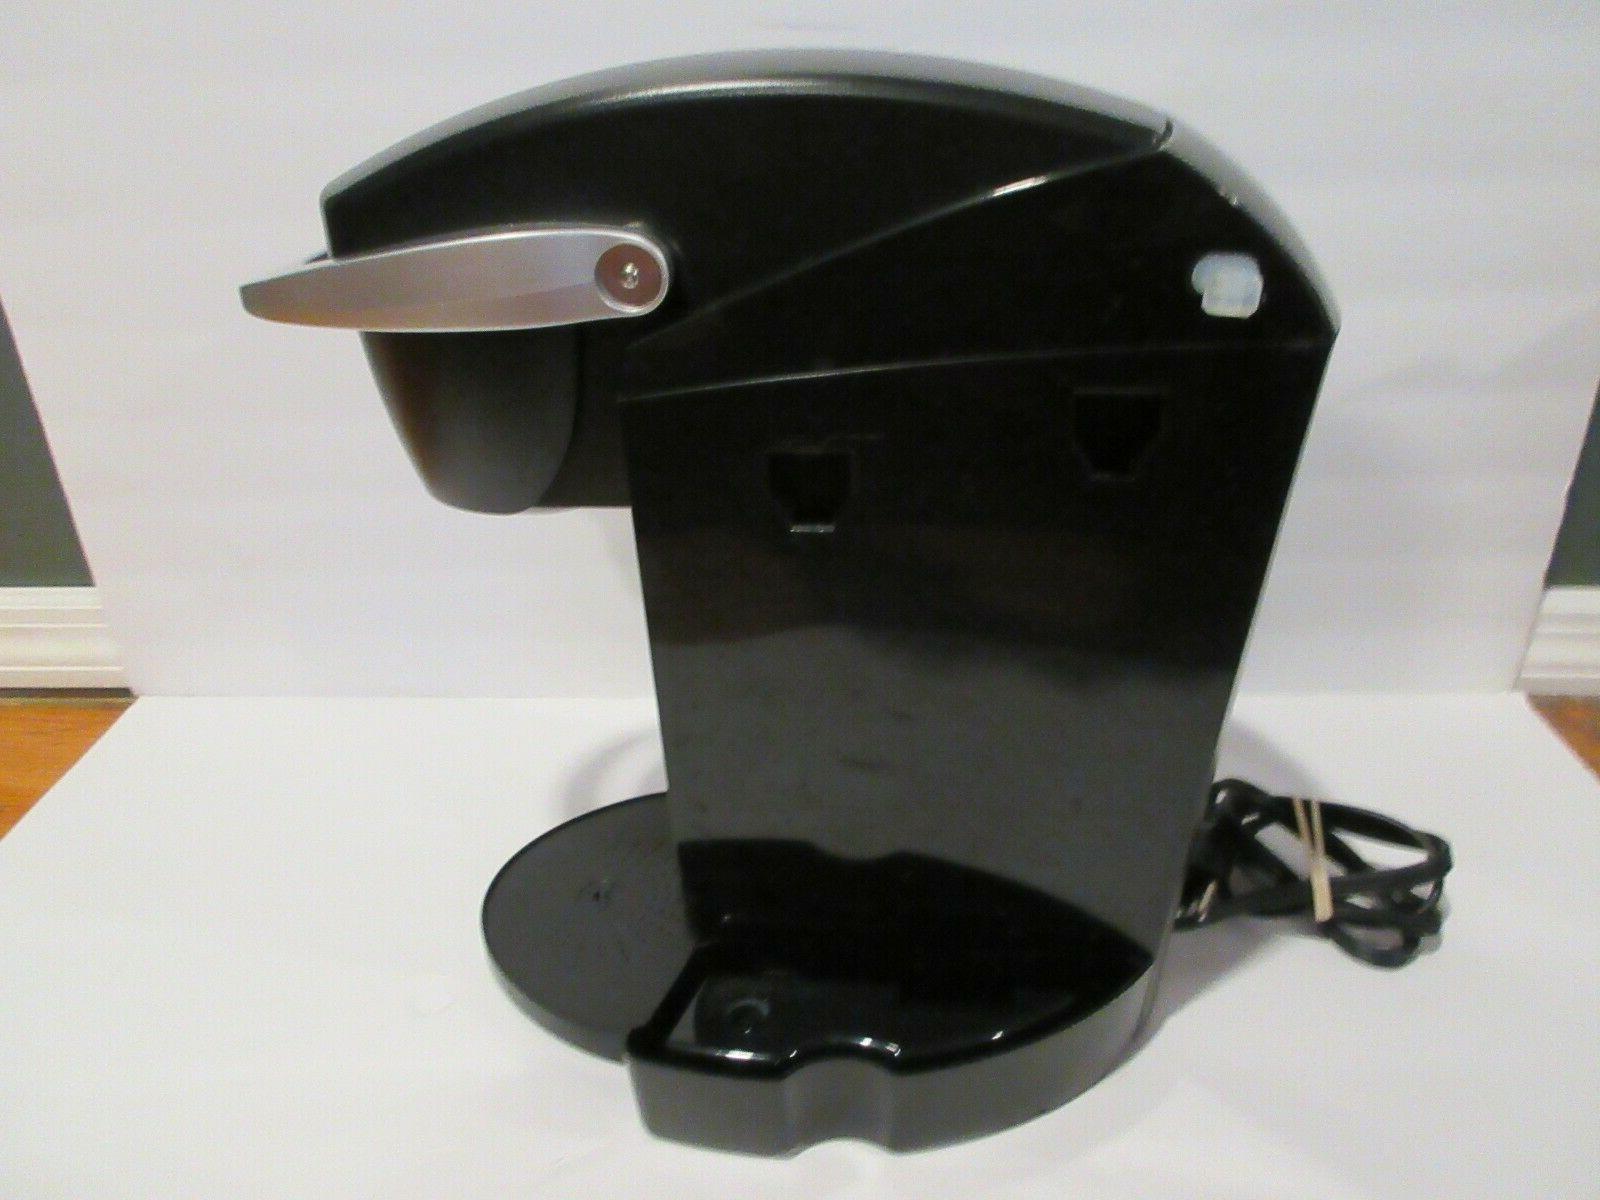 Keurig Black Single Cup System Coffee Maker B40 Tested